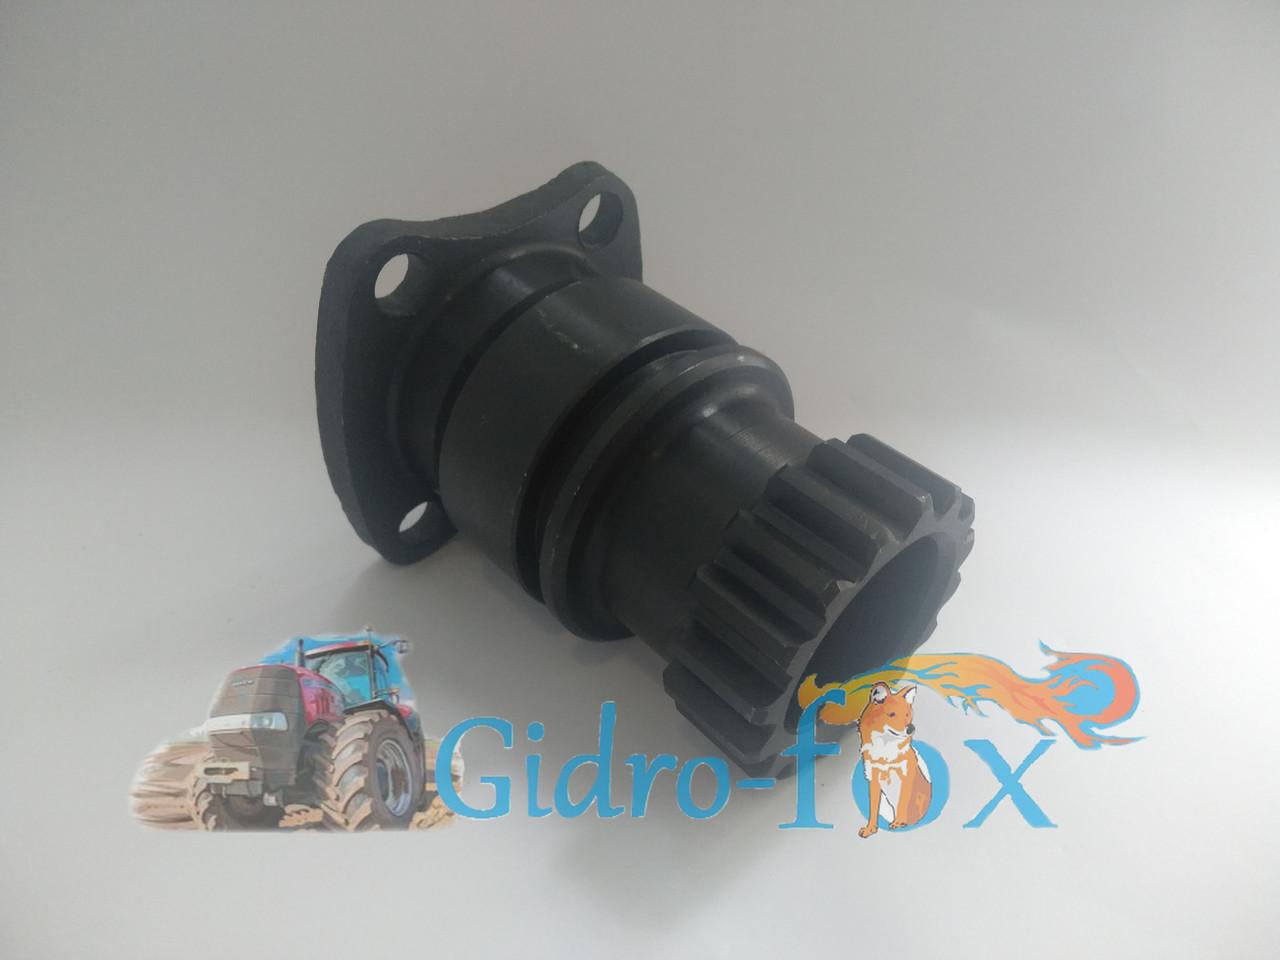 Фланец промежуточной опоры карданного вала ПВМ (МТЗ-82, Д-240) Кт.Н. 72-2209014